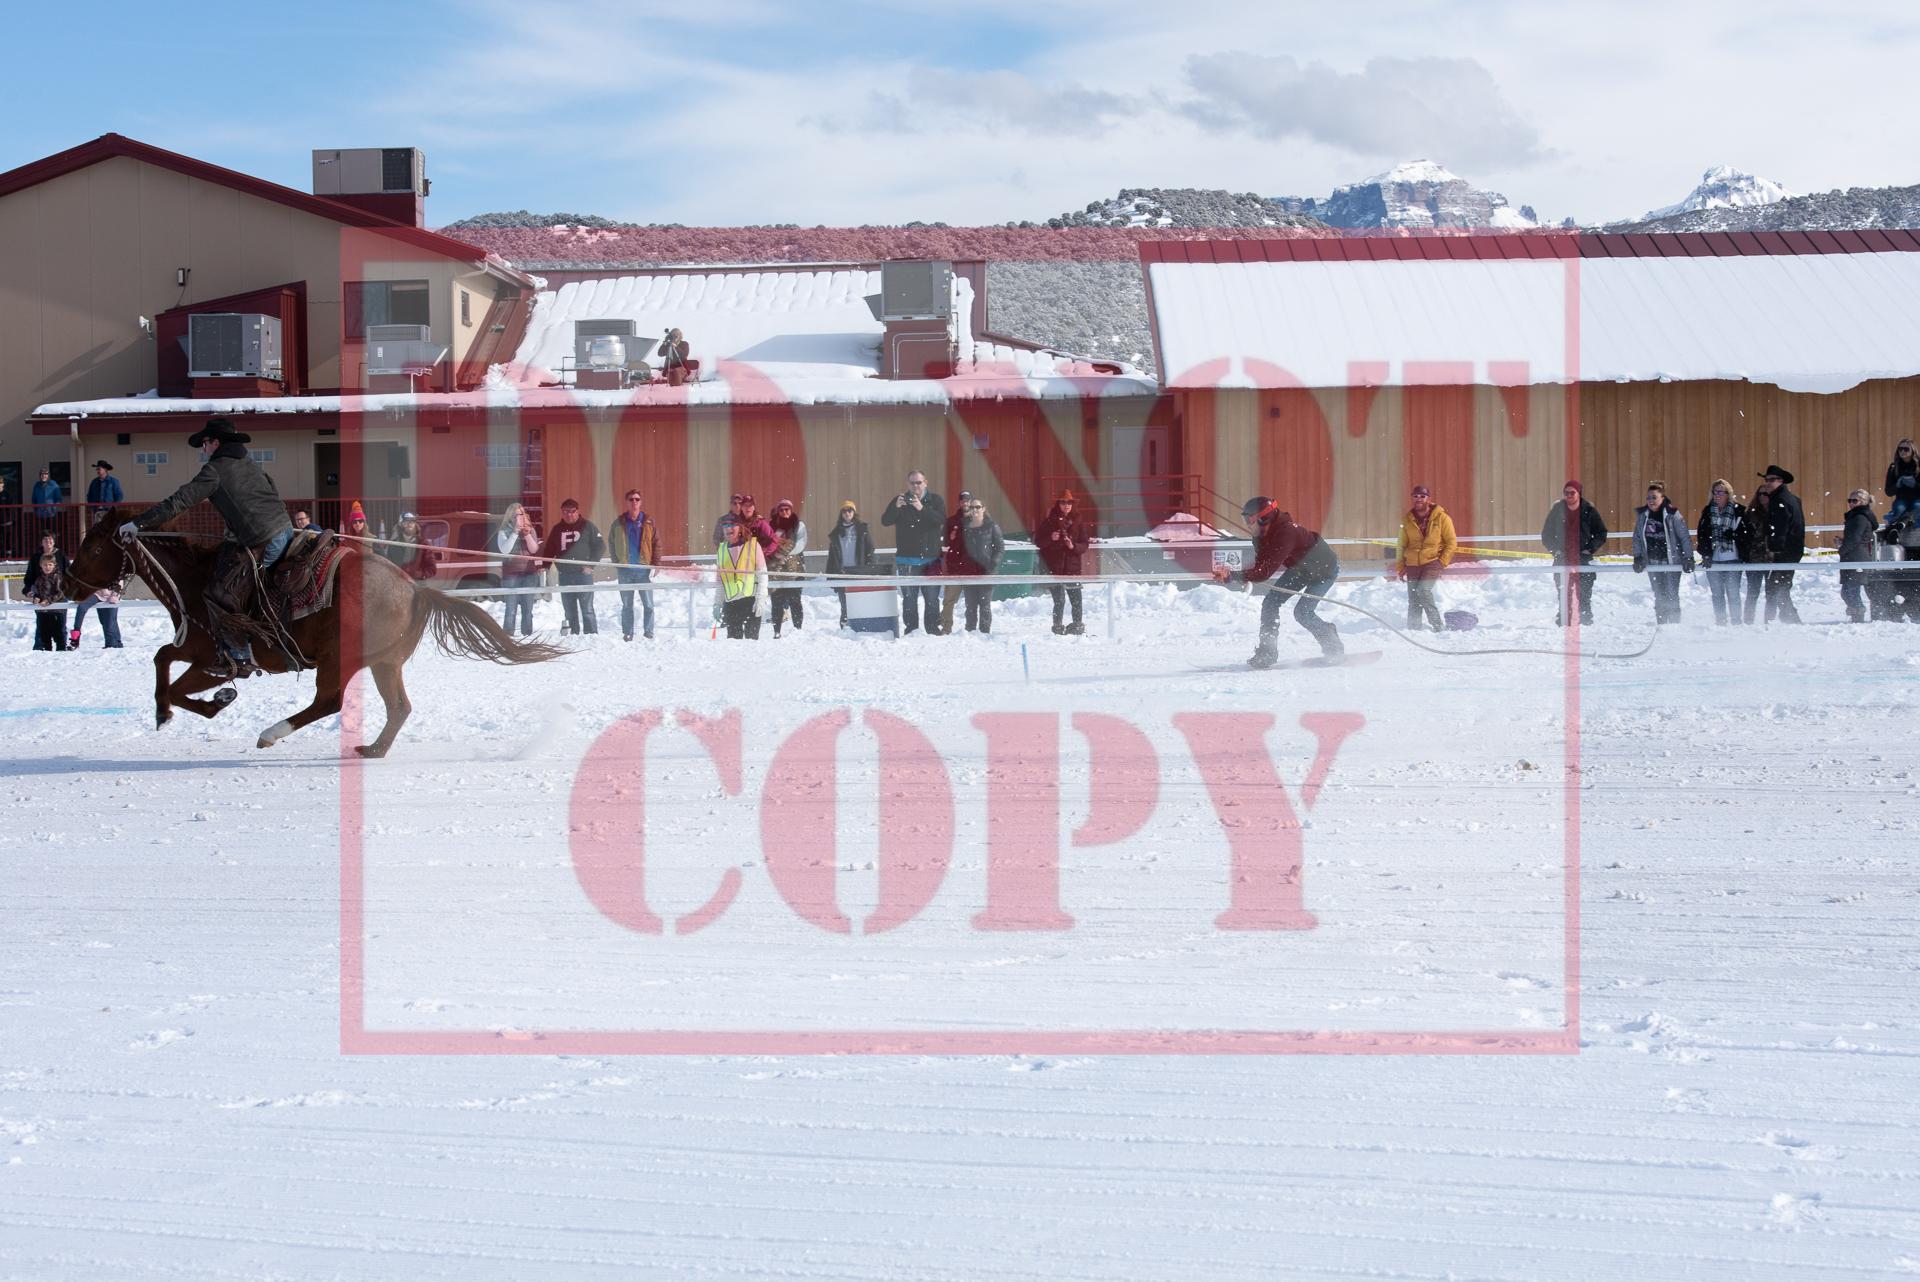 - JW Goode - Snowboard 11